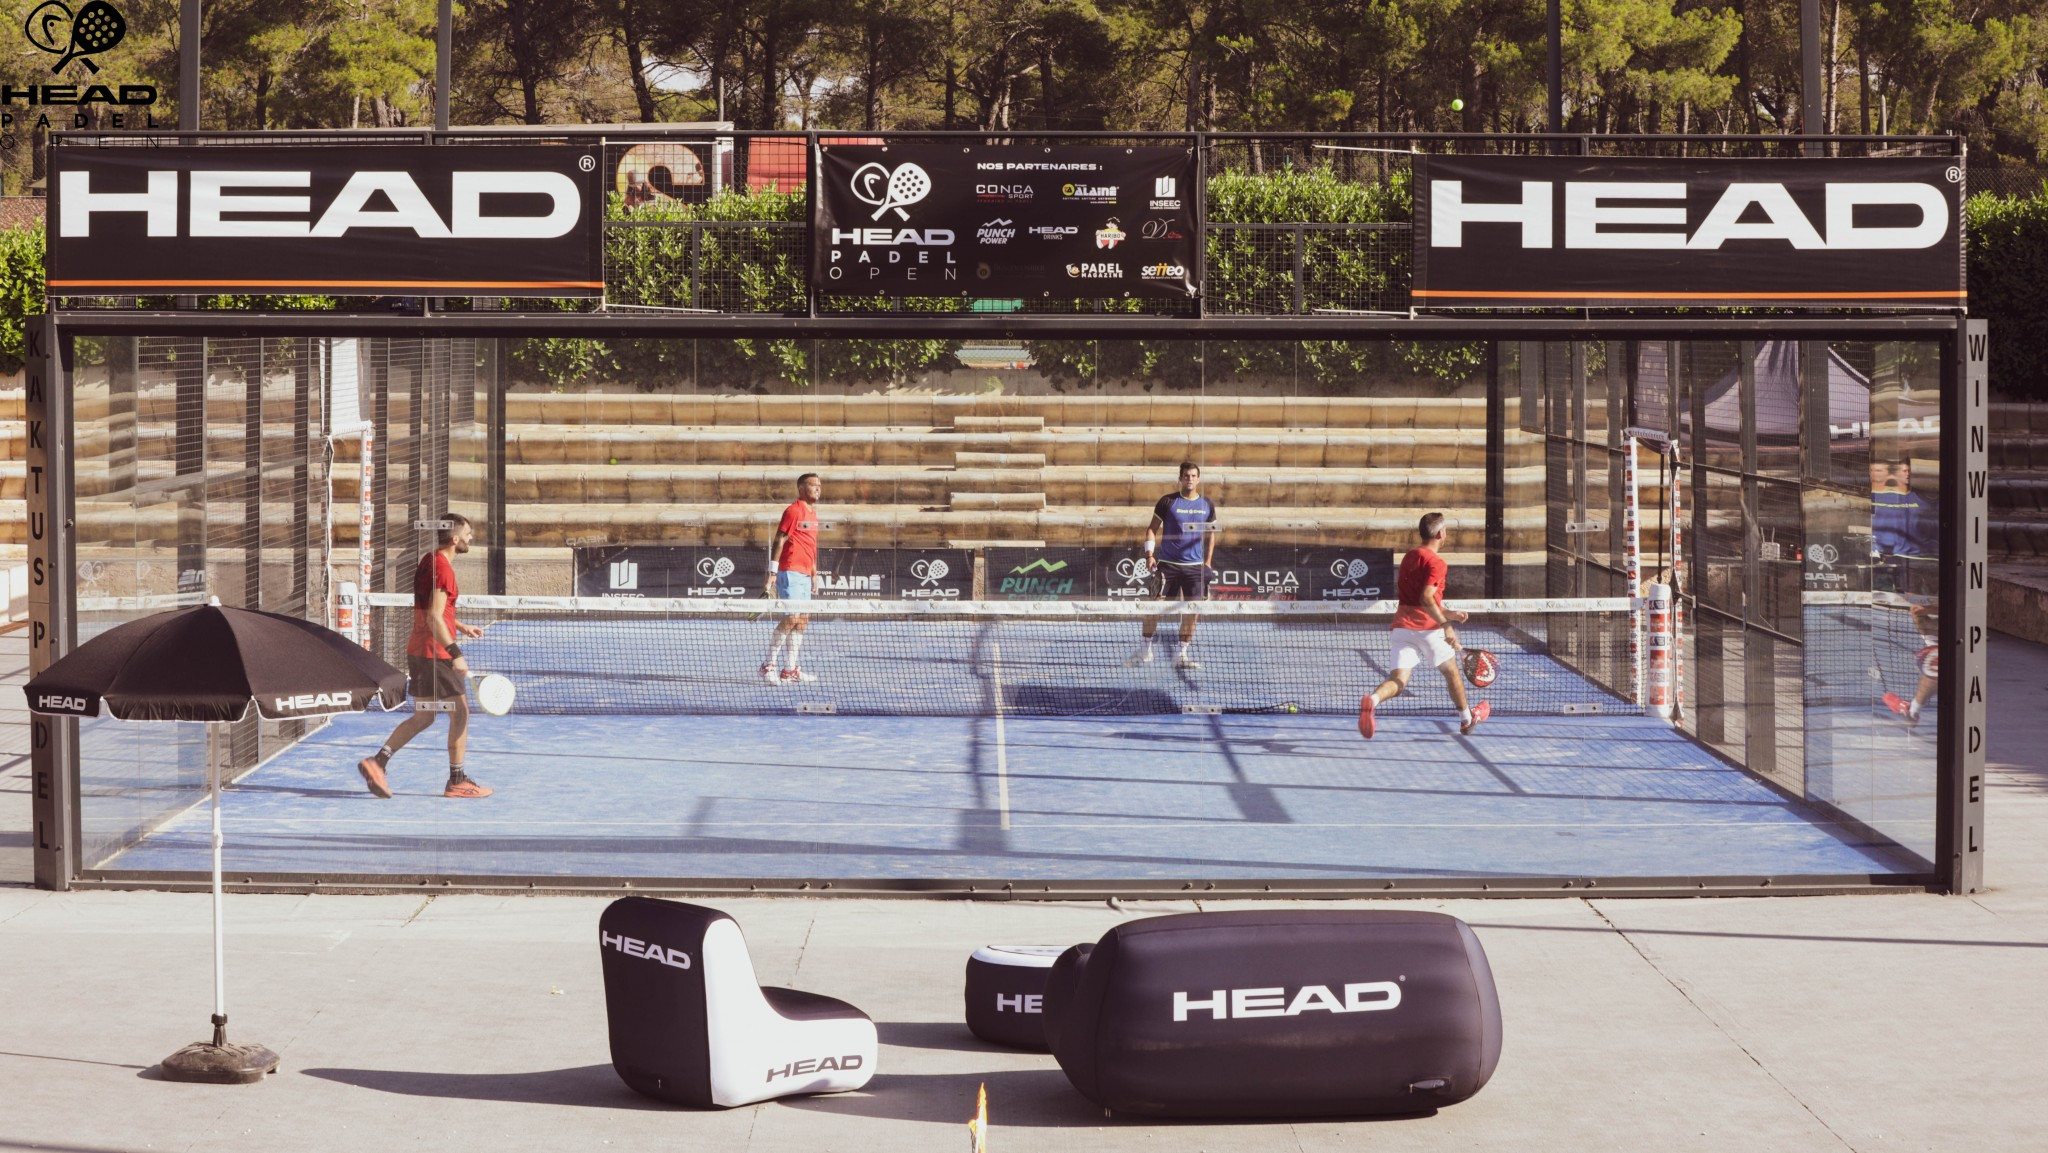 Head Padel Open 2019 - Haziza / Scatena vs. Bergeron / Morillon - 1 / 2 - WinWin Padel Aix